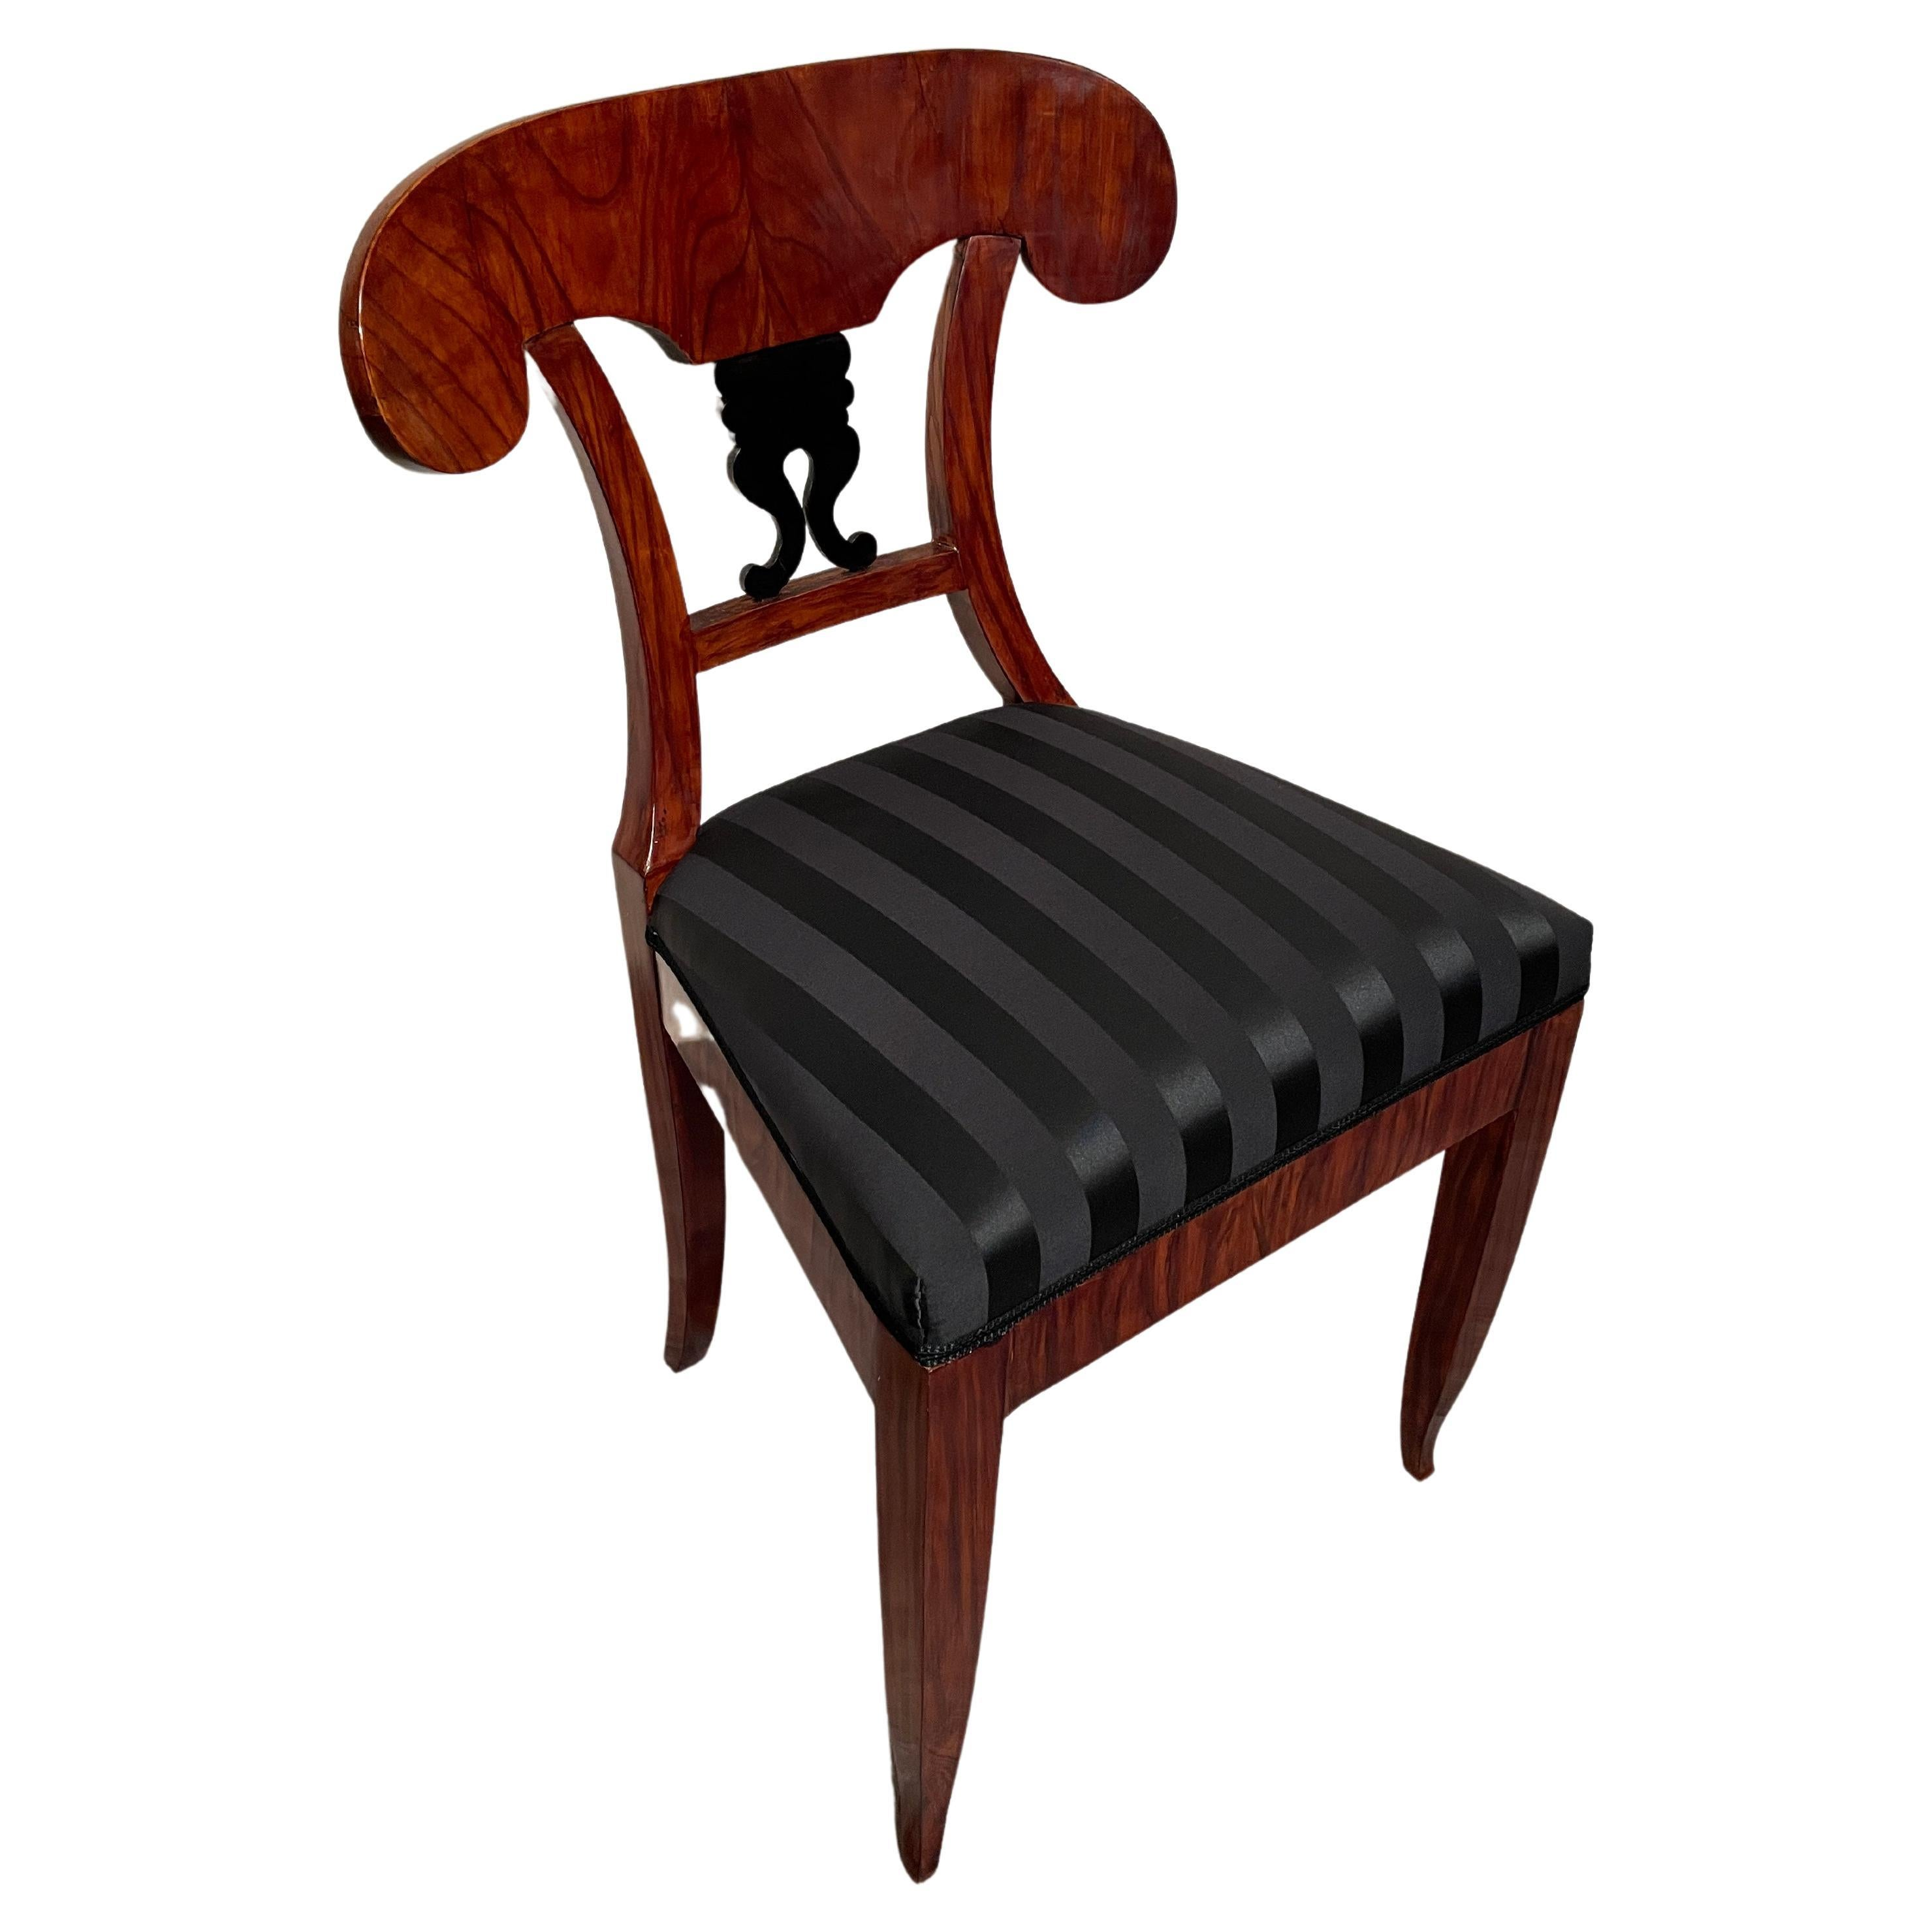 Biedermeier Chair, South German 1820, Walnut